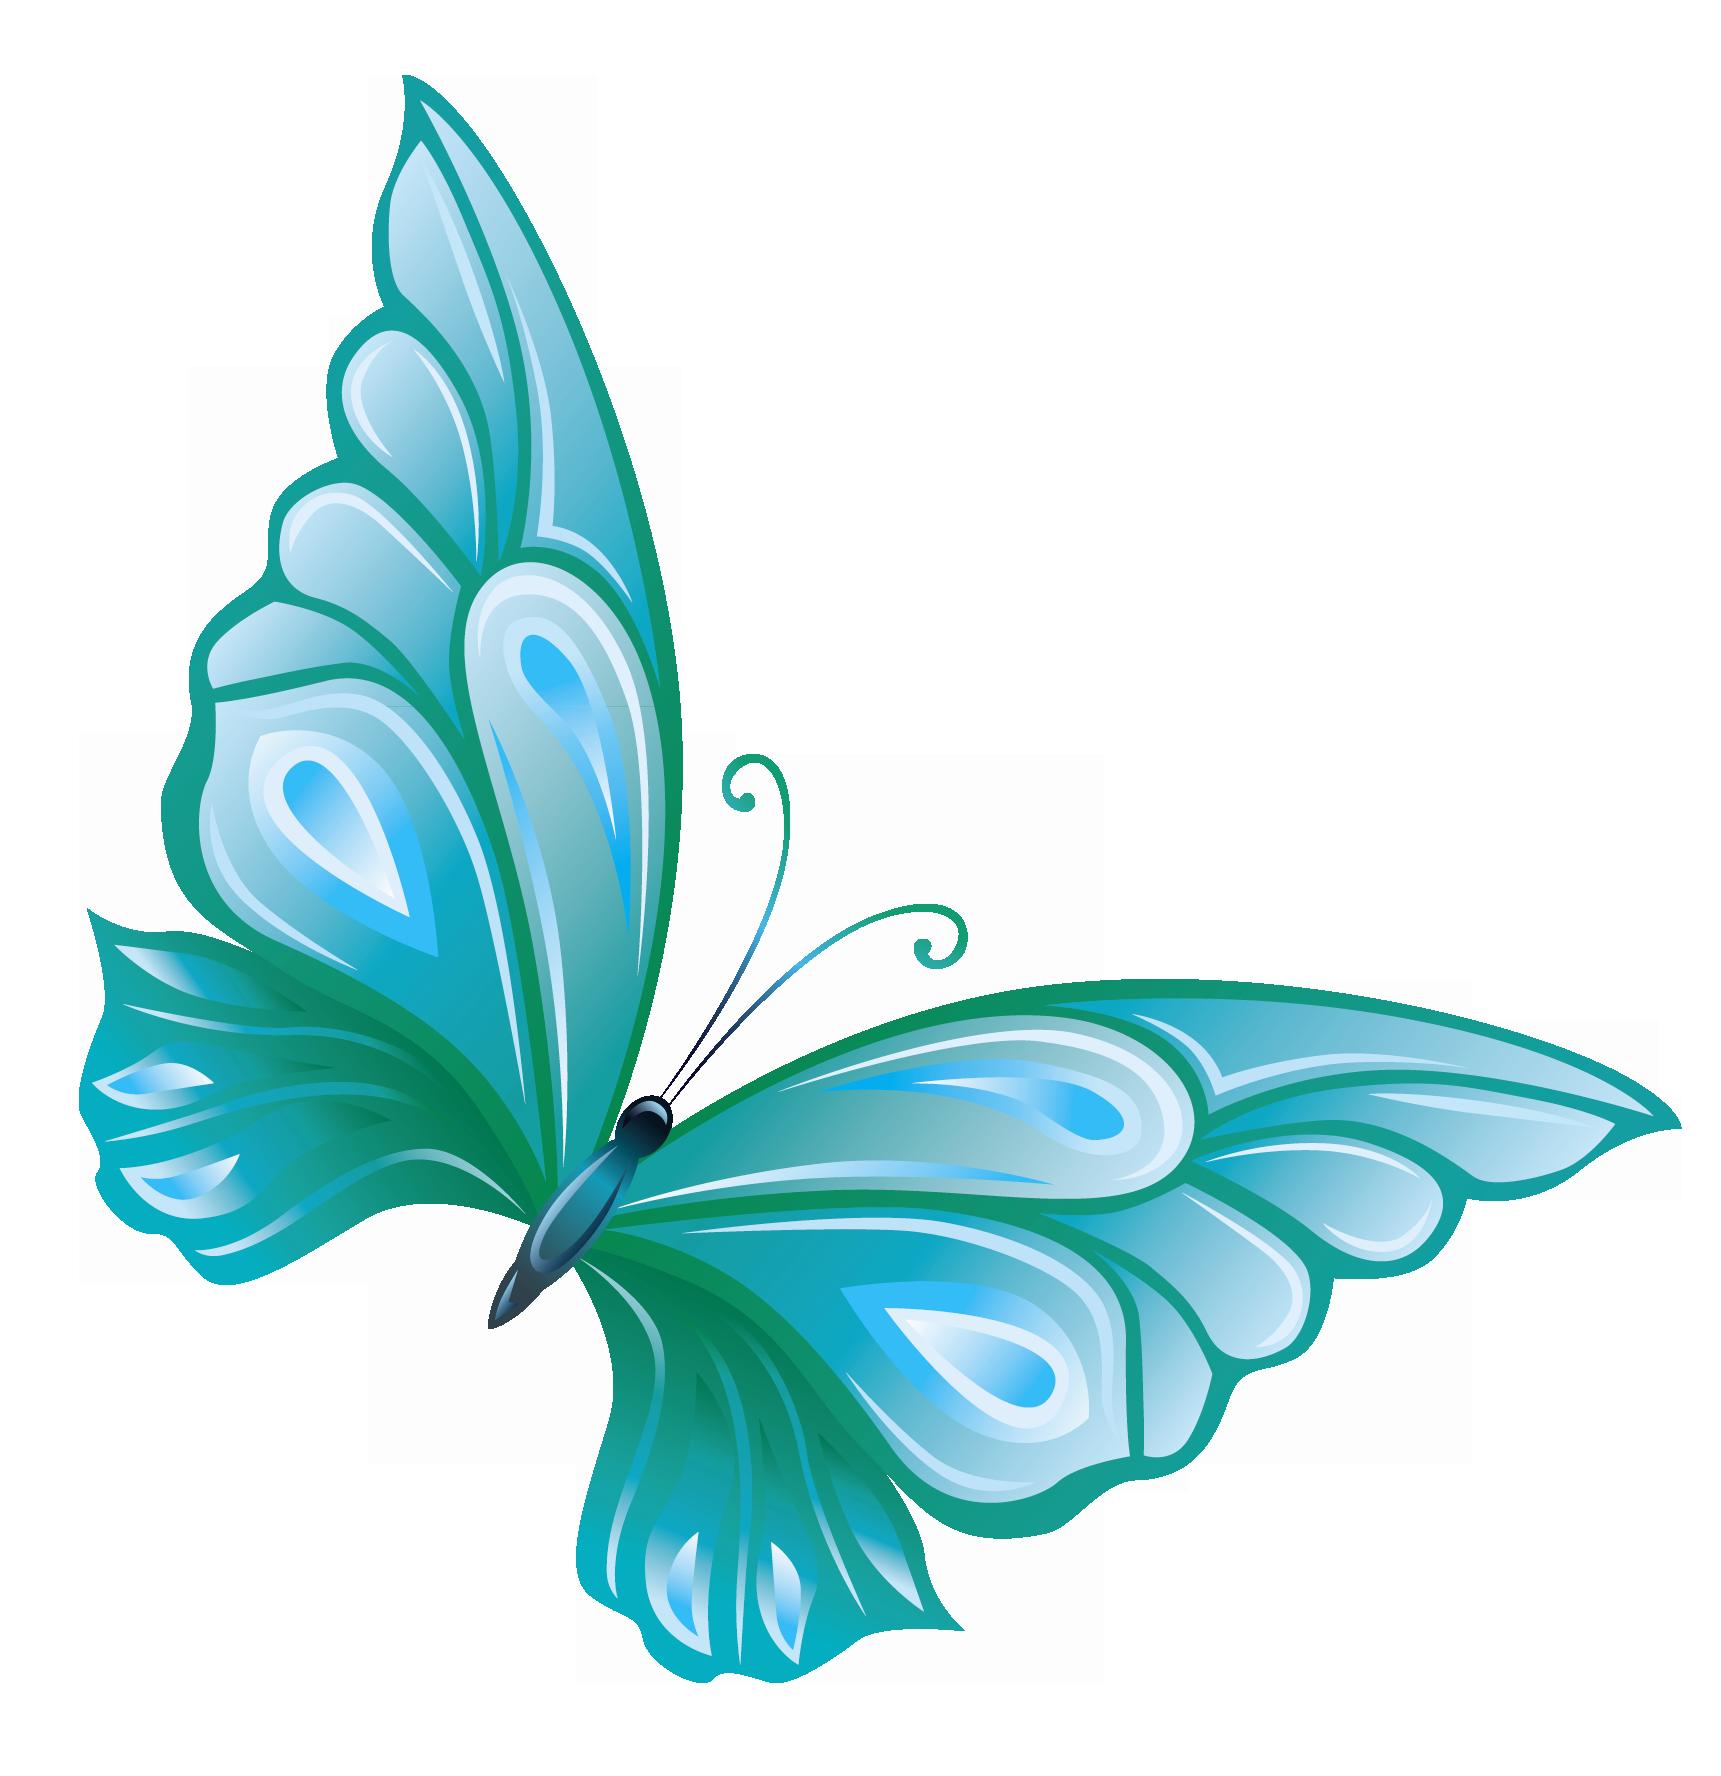 Aqua flower clipart clip art royalty free library Butterfly Clip art - Transparent Blue Butterfly PNG Clipart 1721 ... clip art royalty free library